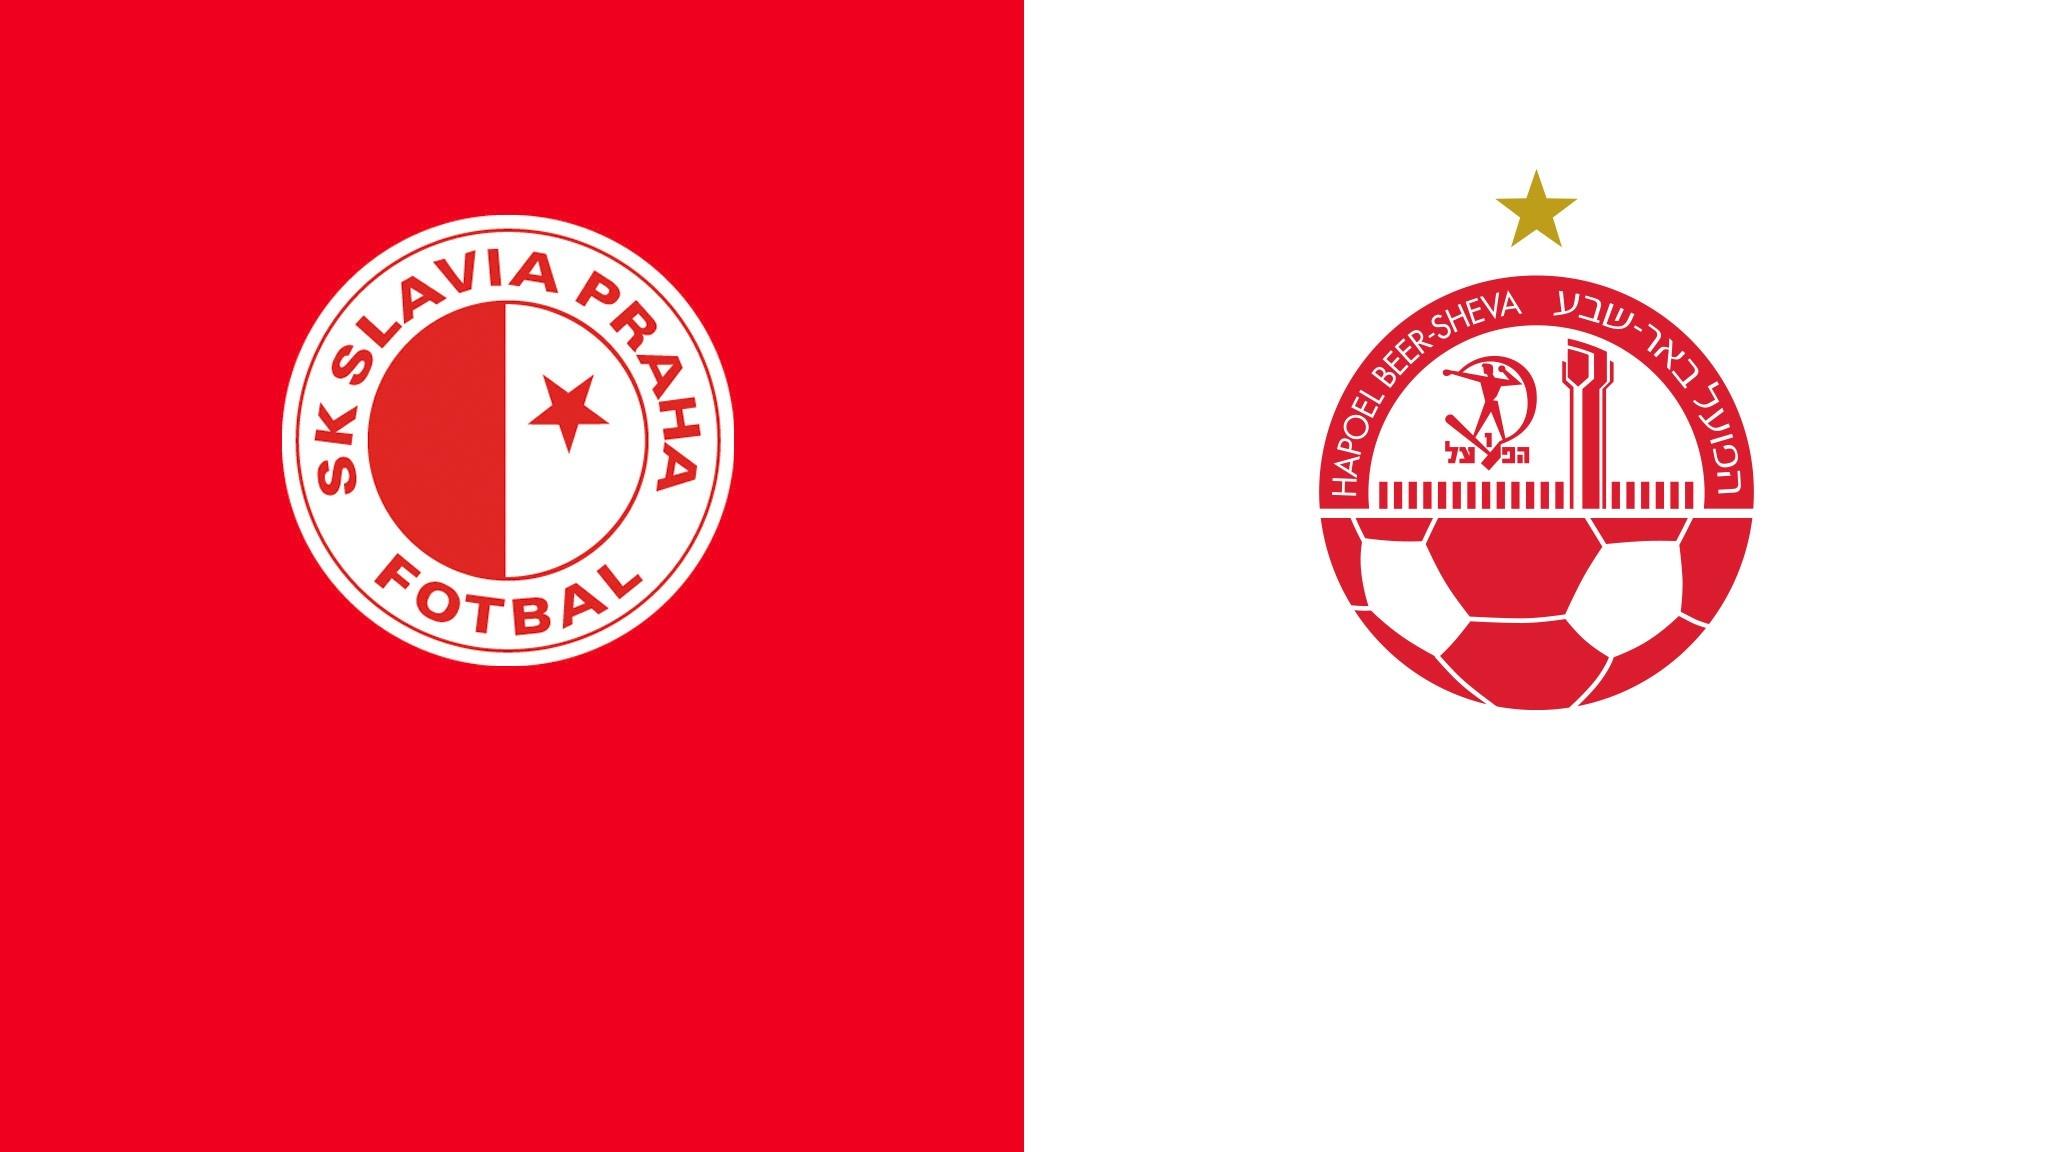 Slavia Nice Stream Inter Milan Vs Slavia Prague Live